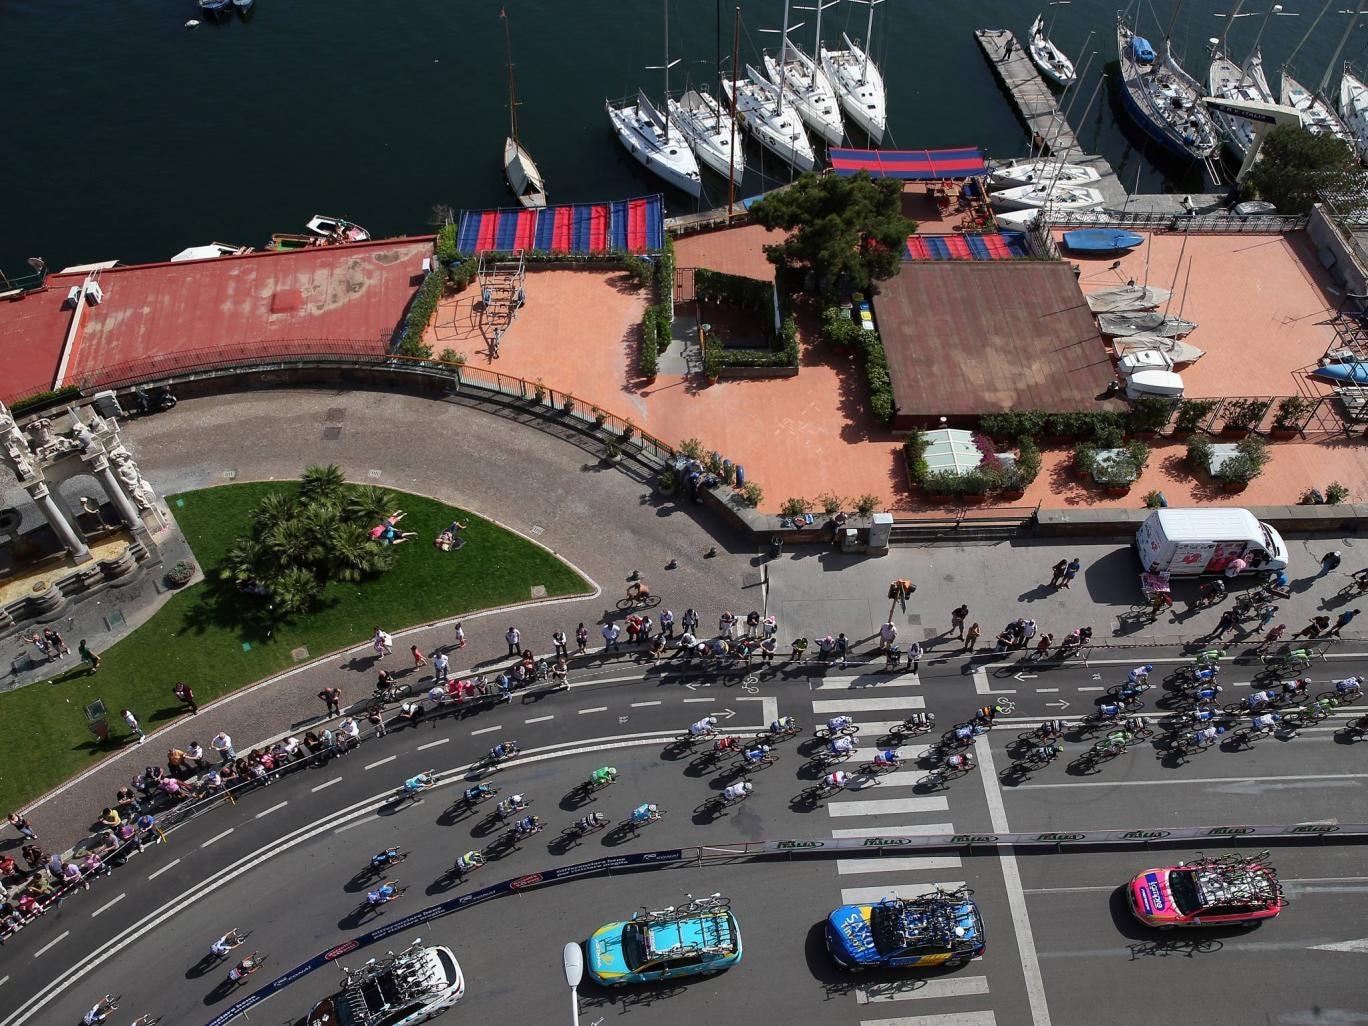 An overhead view of the Giro d'Italia